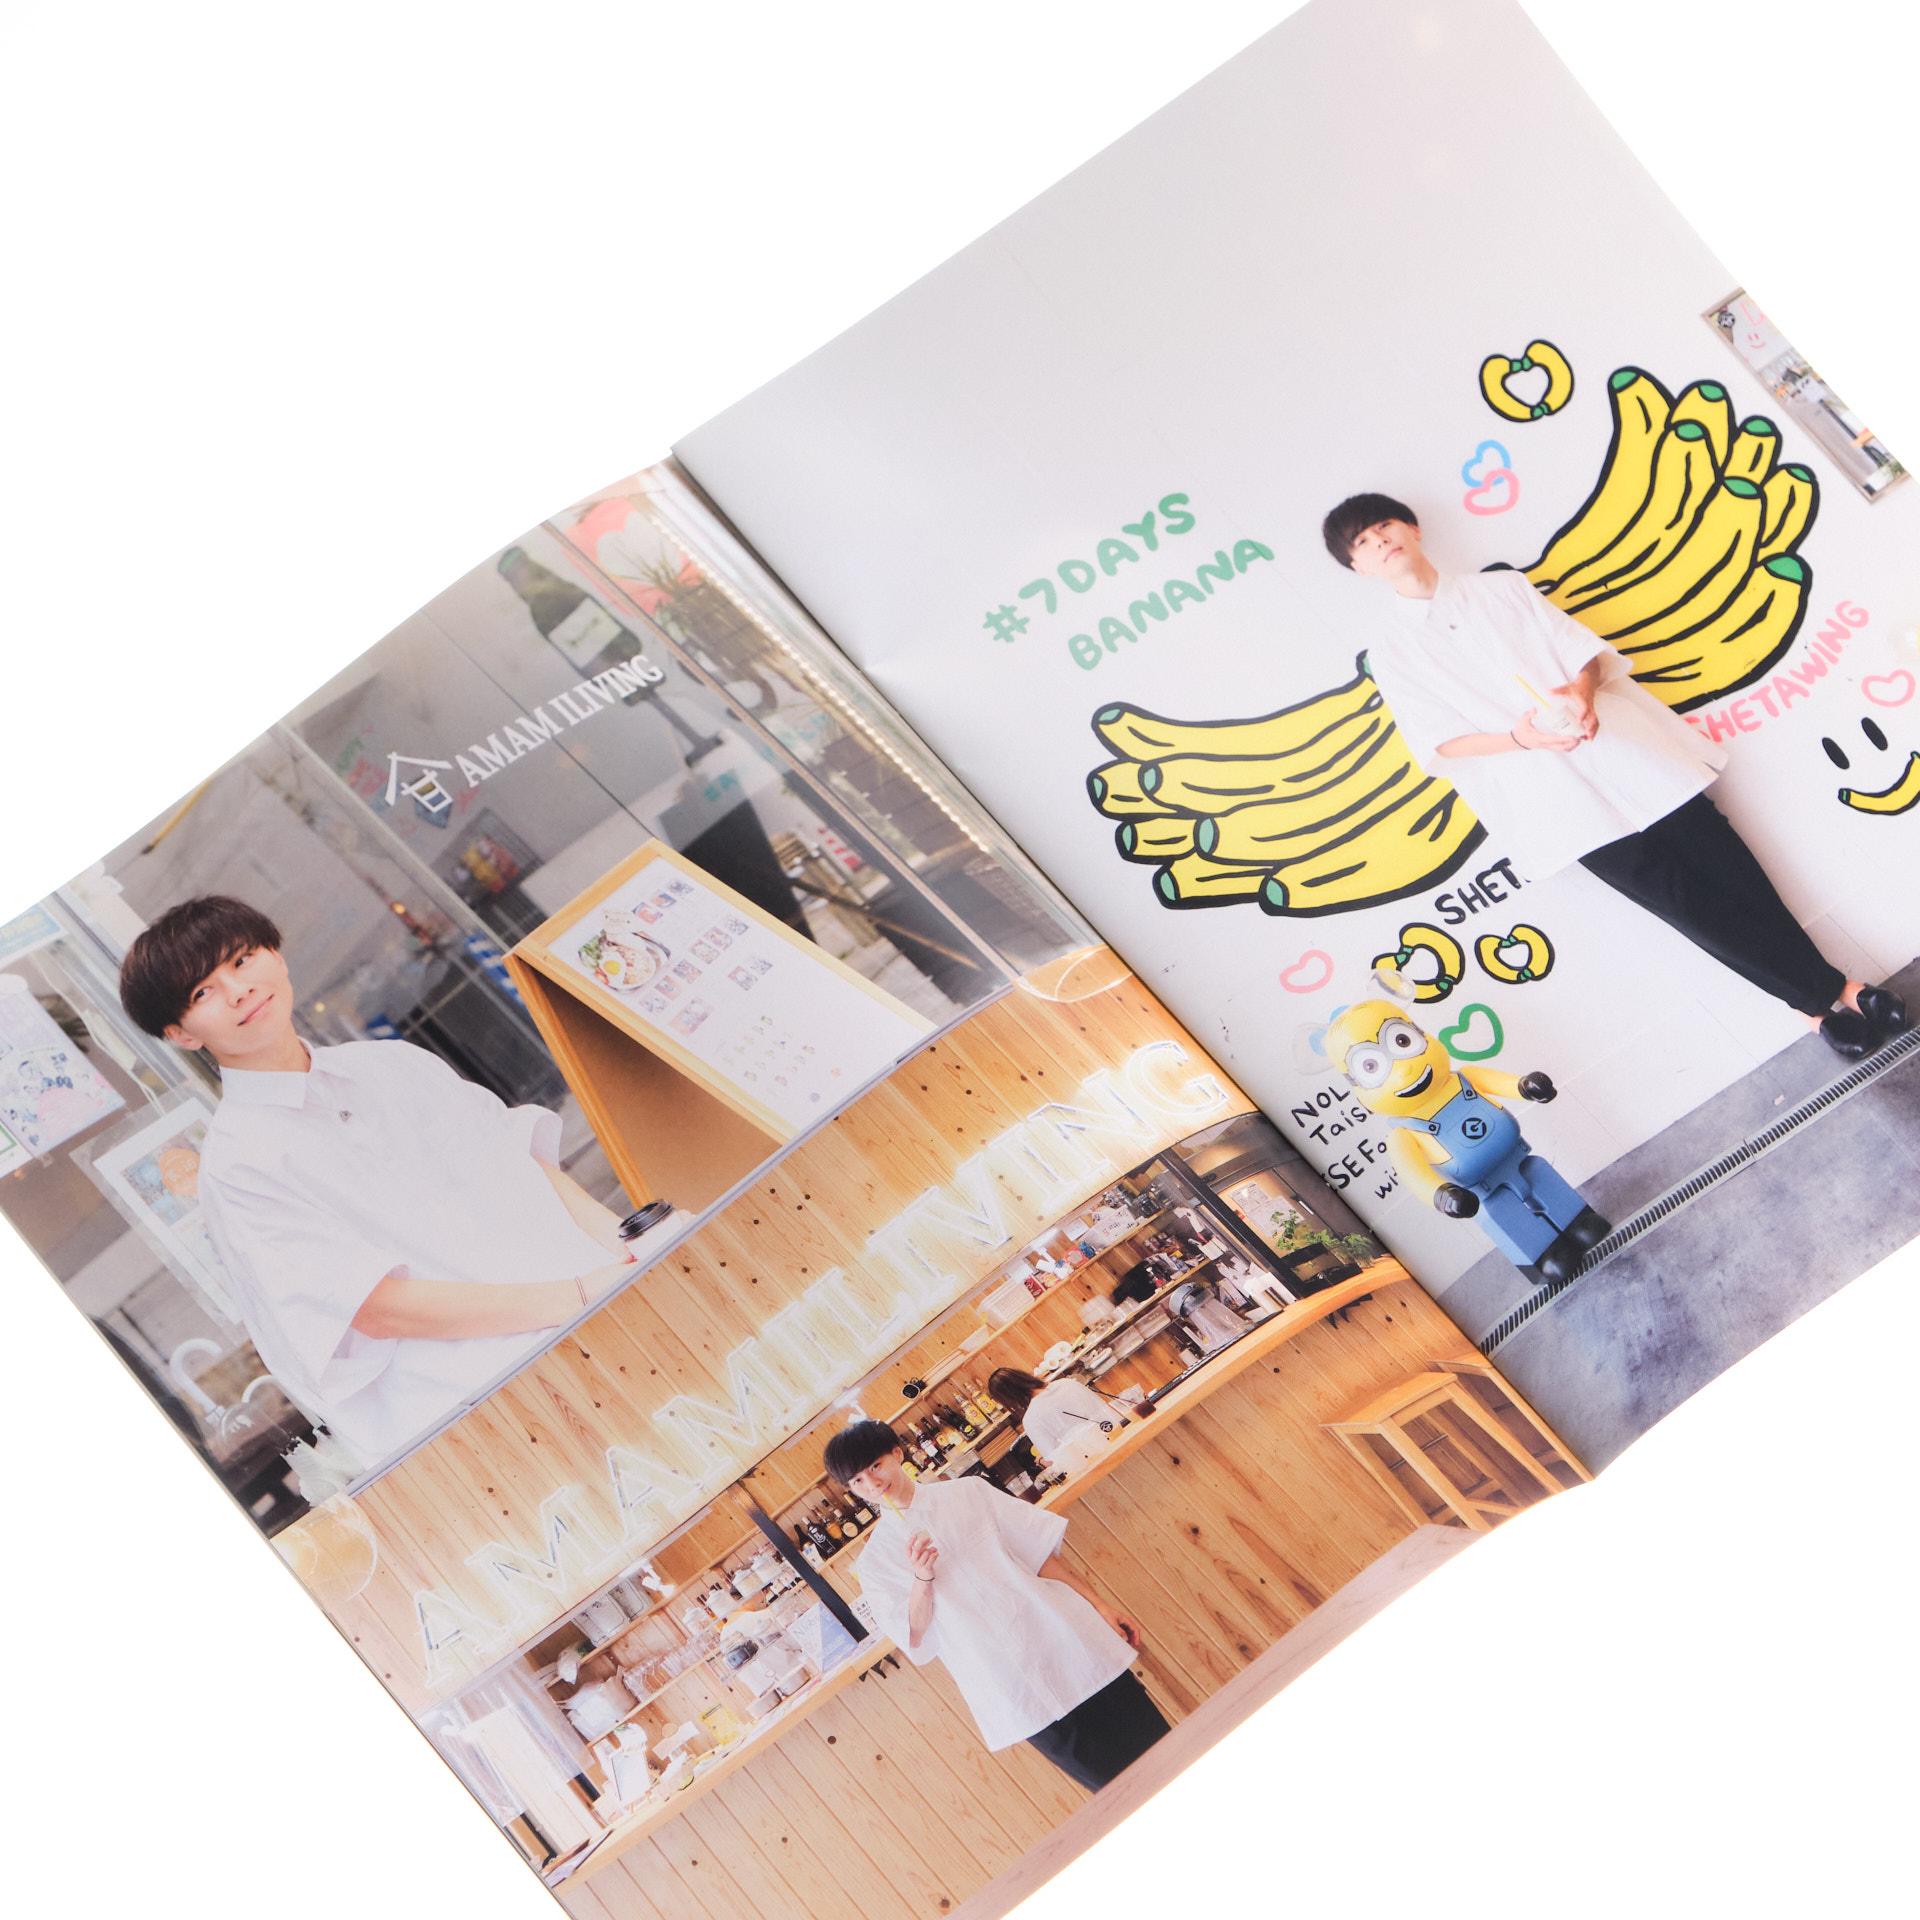 2020.10.23 DC夕霧コラボ・チェーン・葵ソログッズ5925.jpg